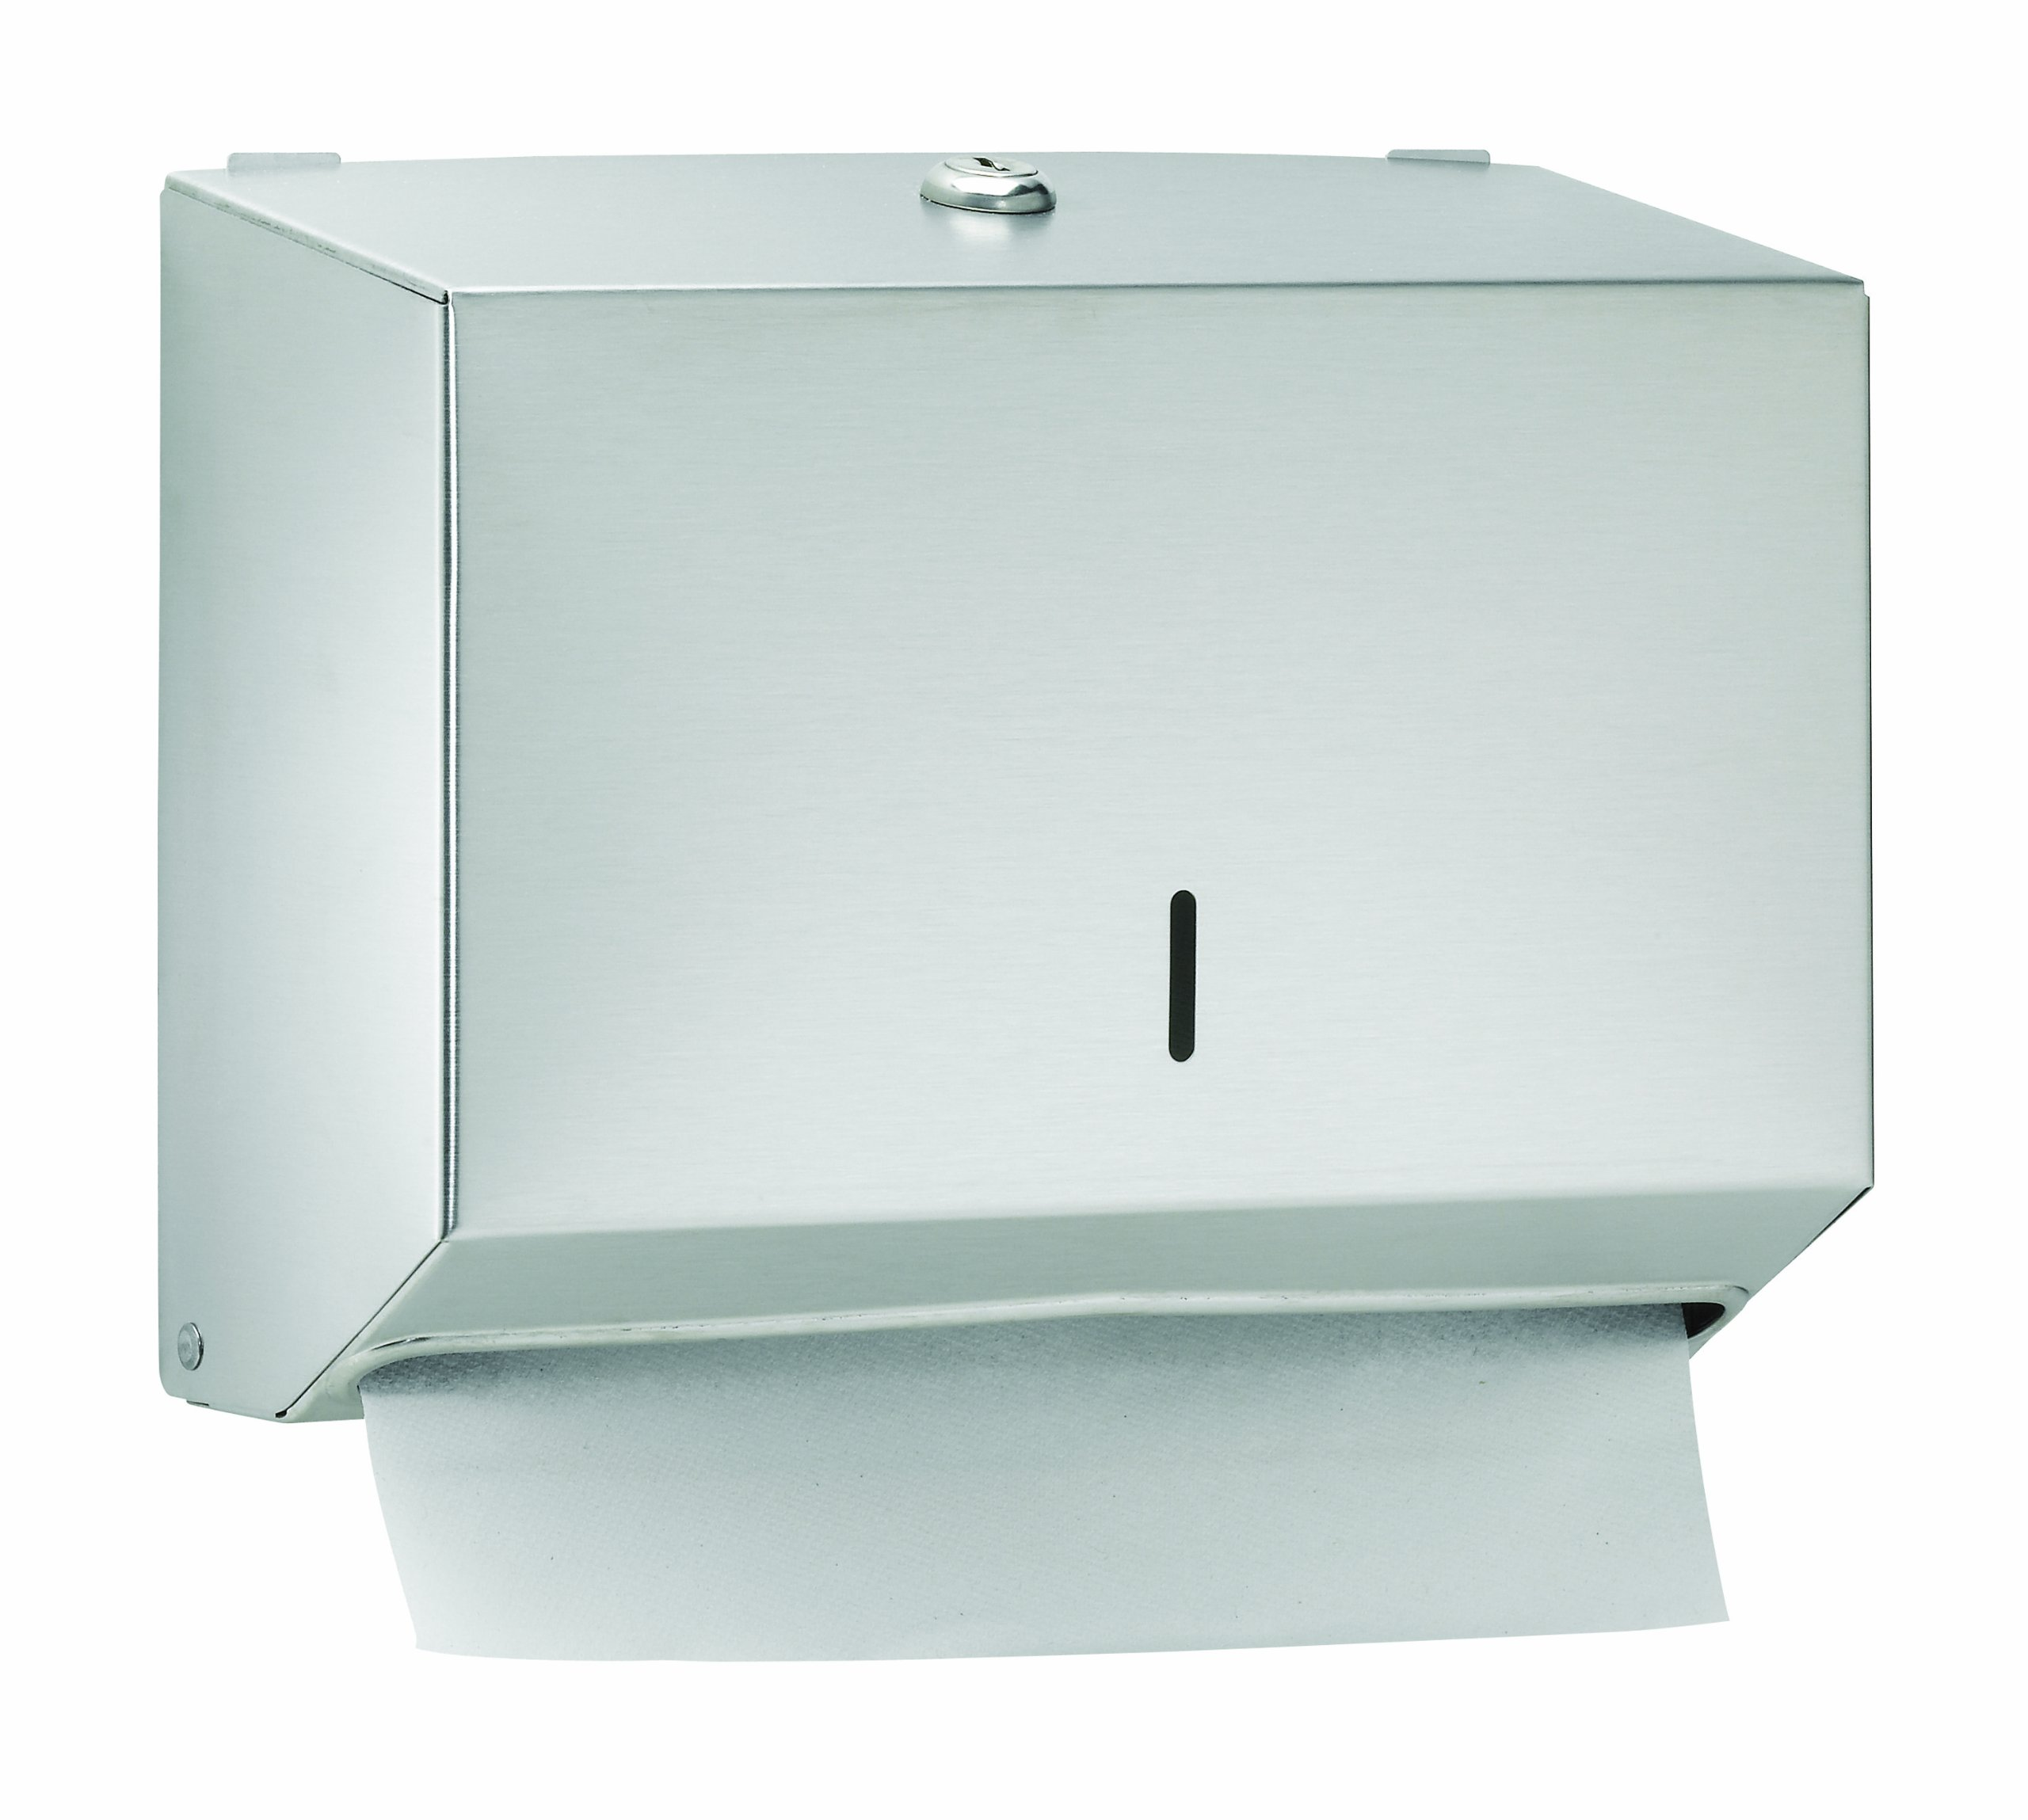 Bradley 252-000000 Stainless Steel Surface Mounted Towel Dispenser, 11'' Width x 8'' Height x 4'' Depth